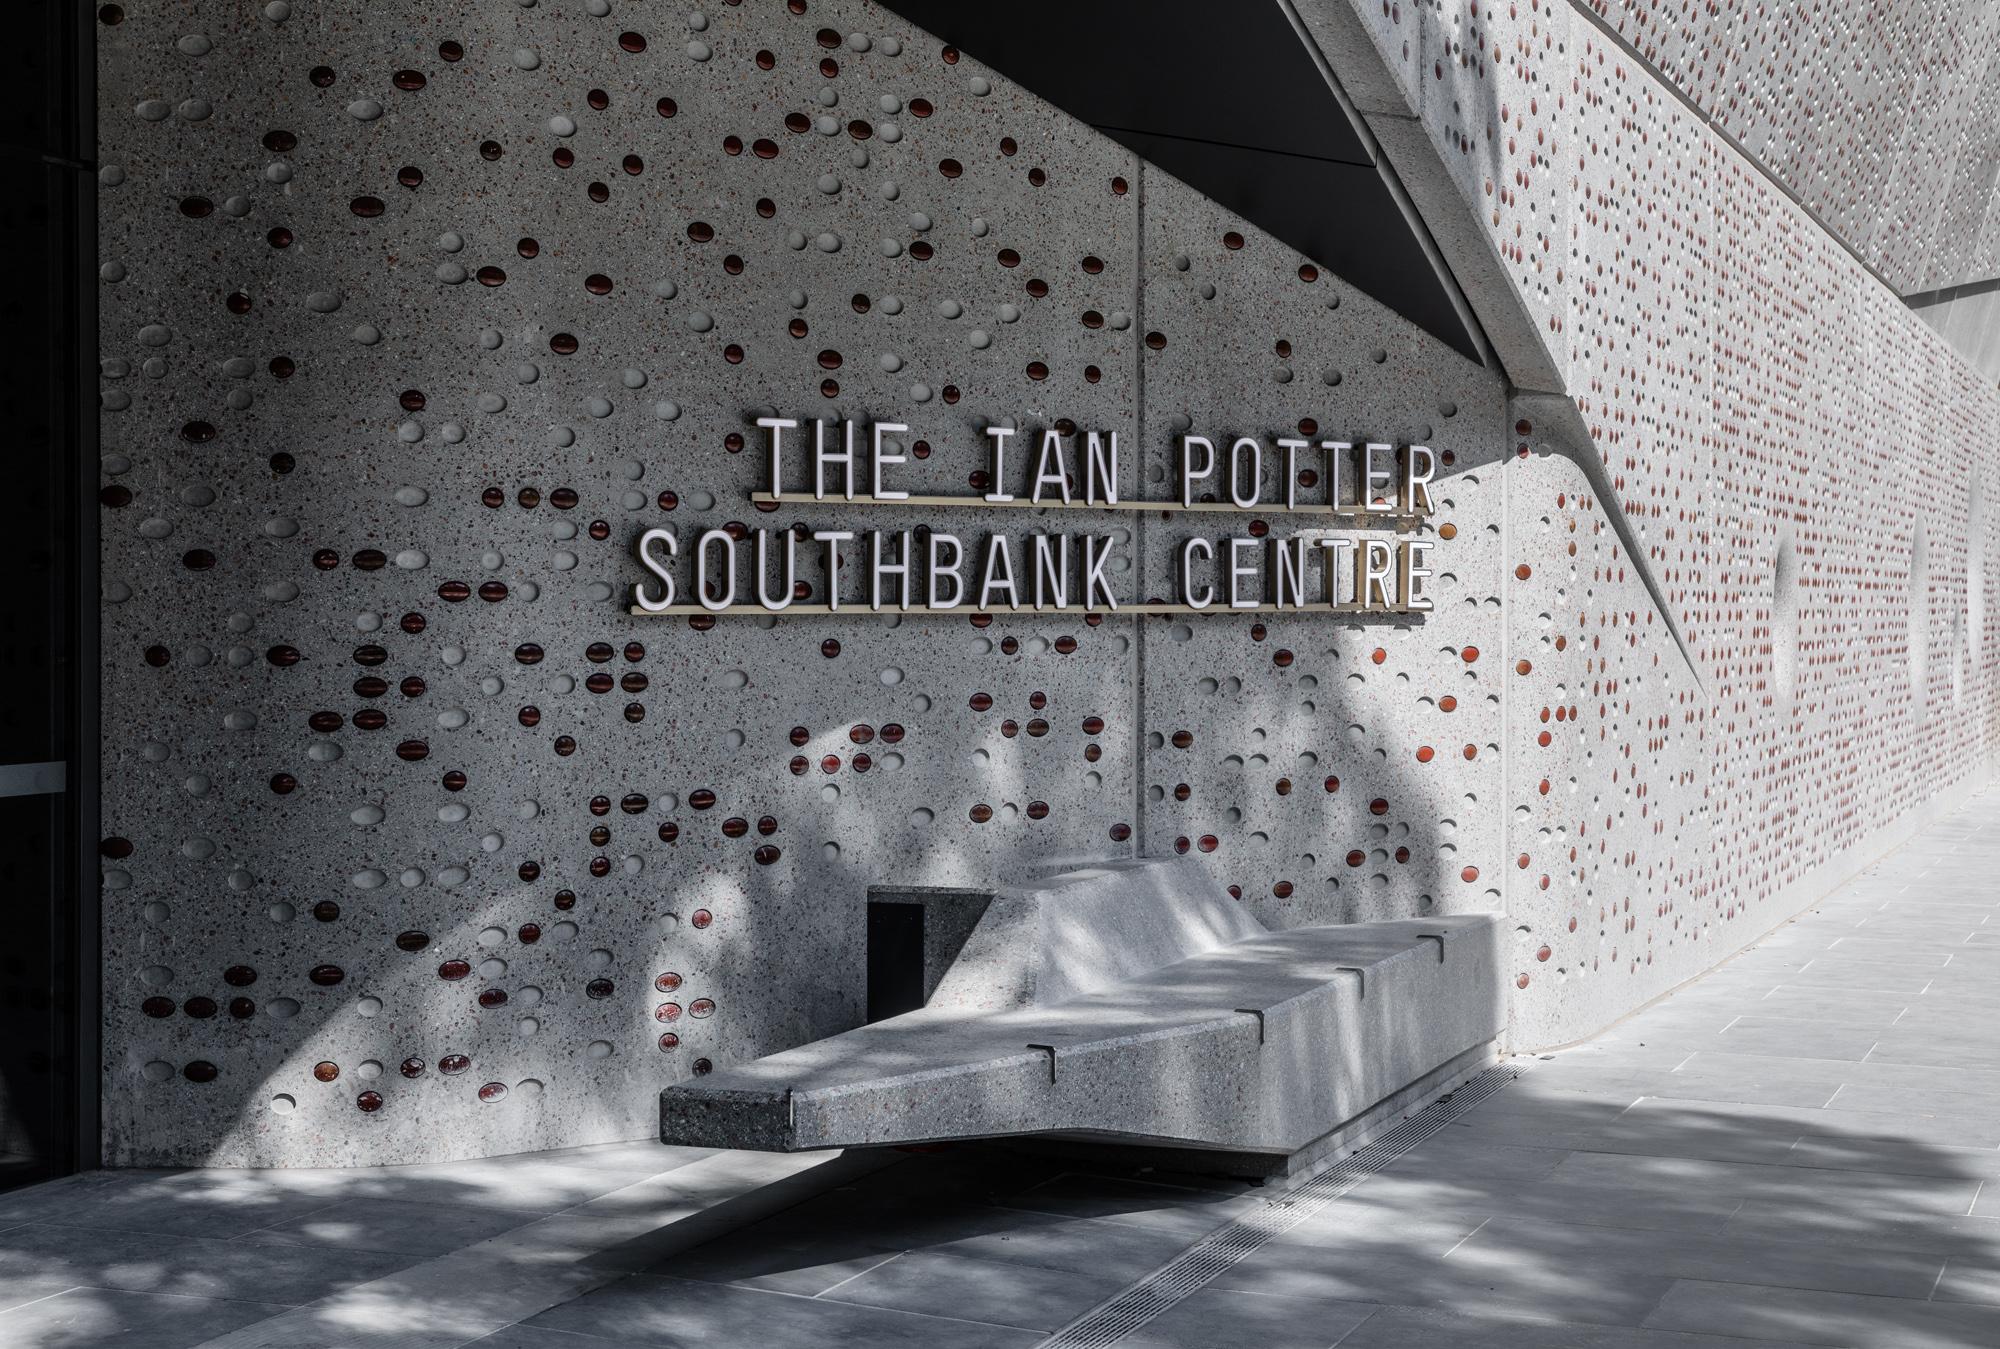 Ian Potter Southbank Centre Image 7